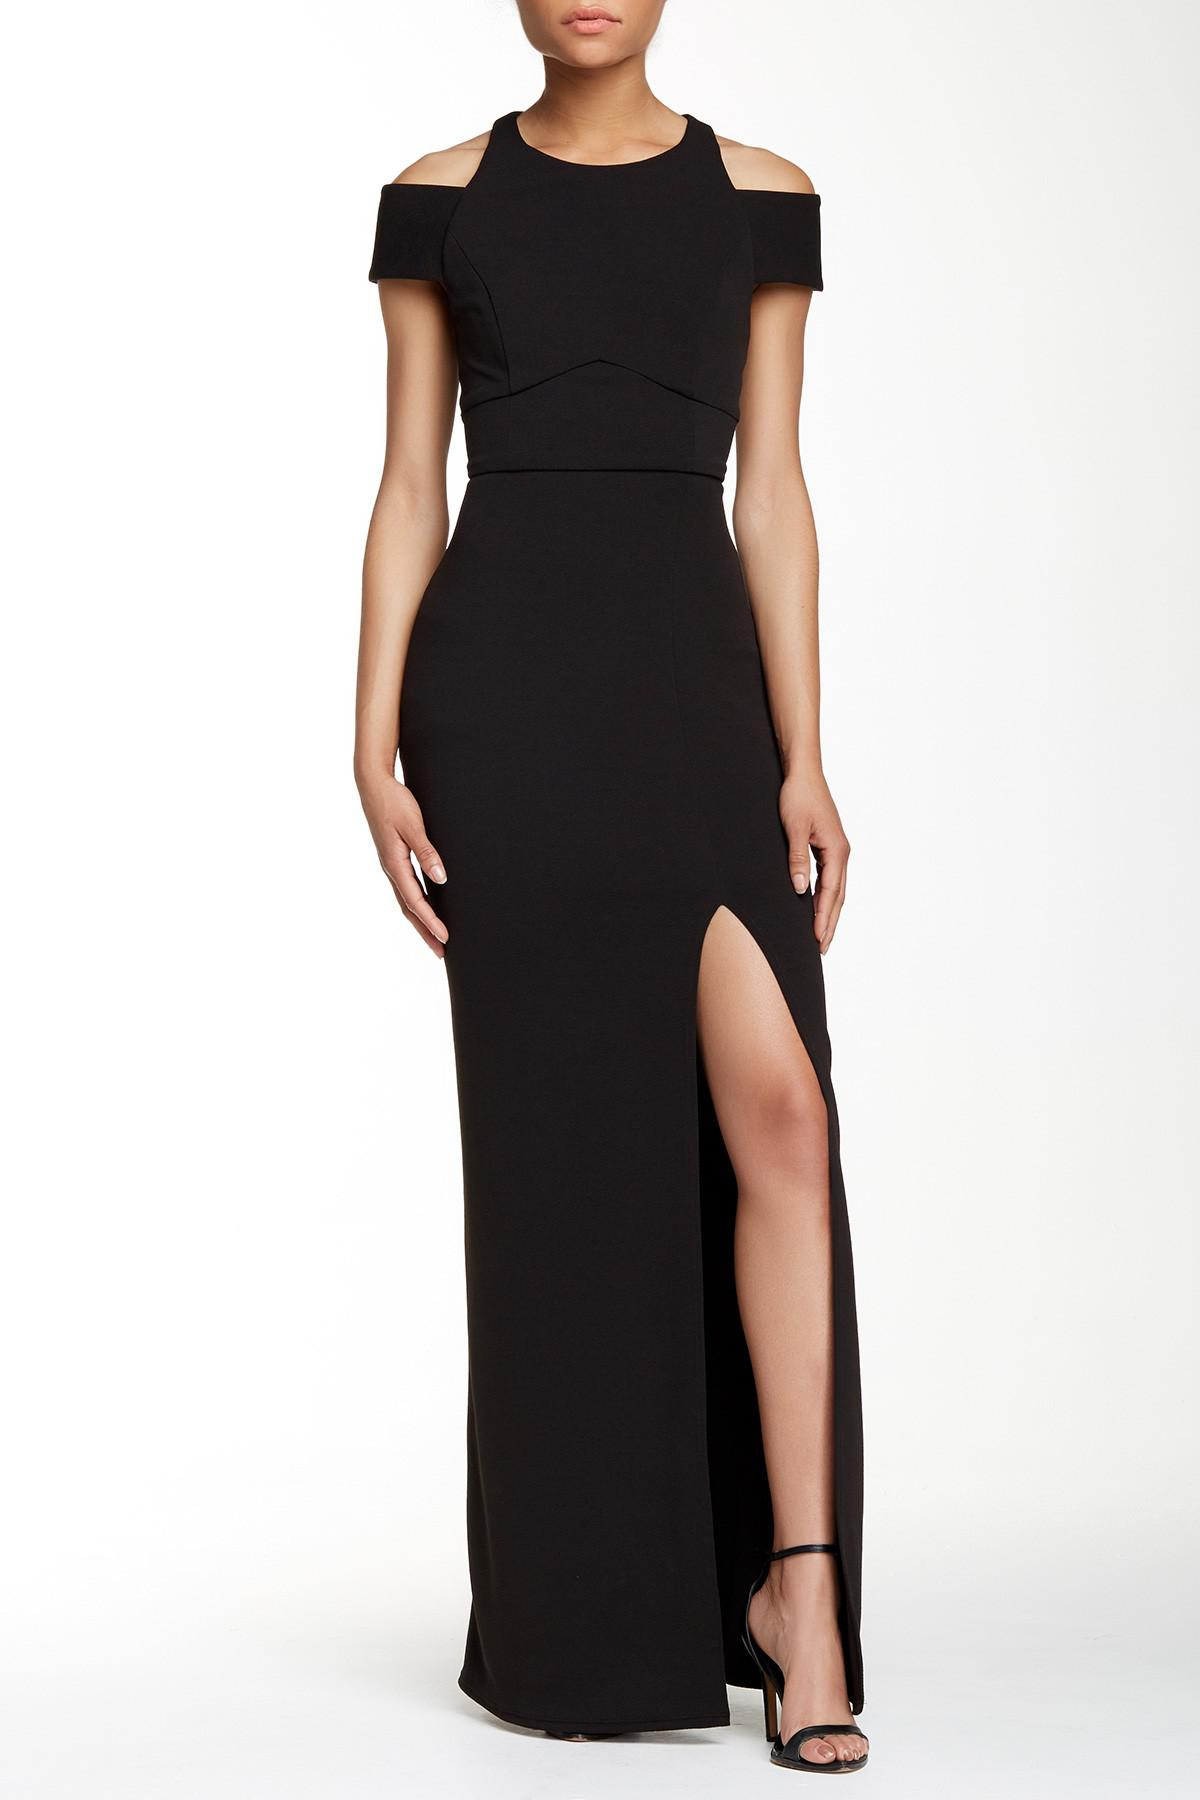 cc70e8b6eab0aa Lyst - Abs By Allen Schwartz Cut-out Crepe Gown in Black